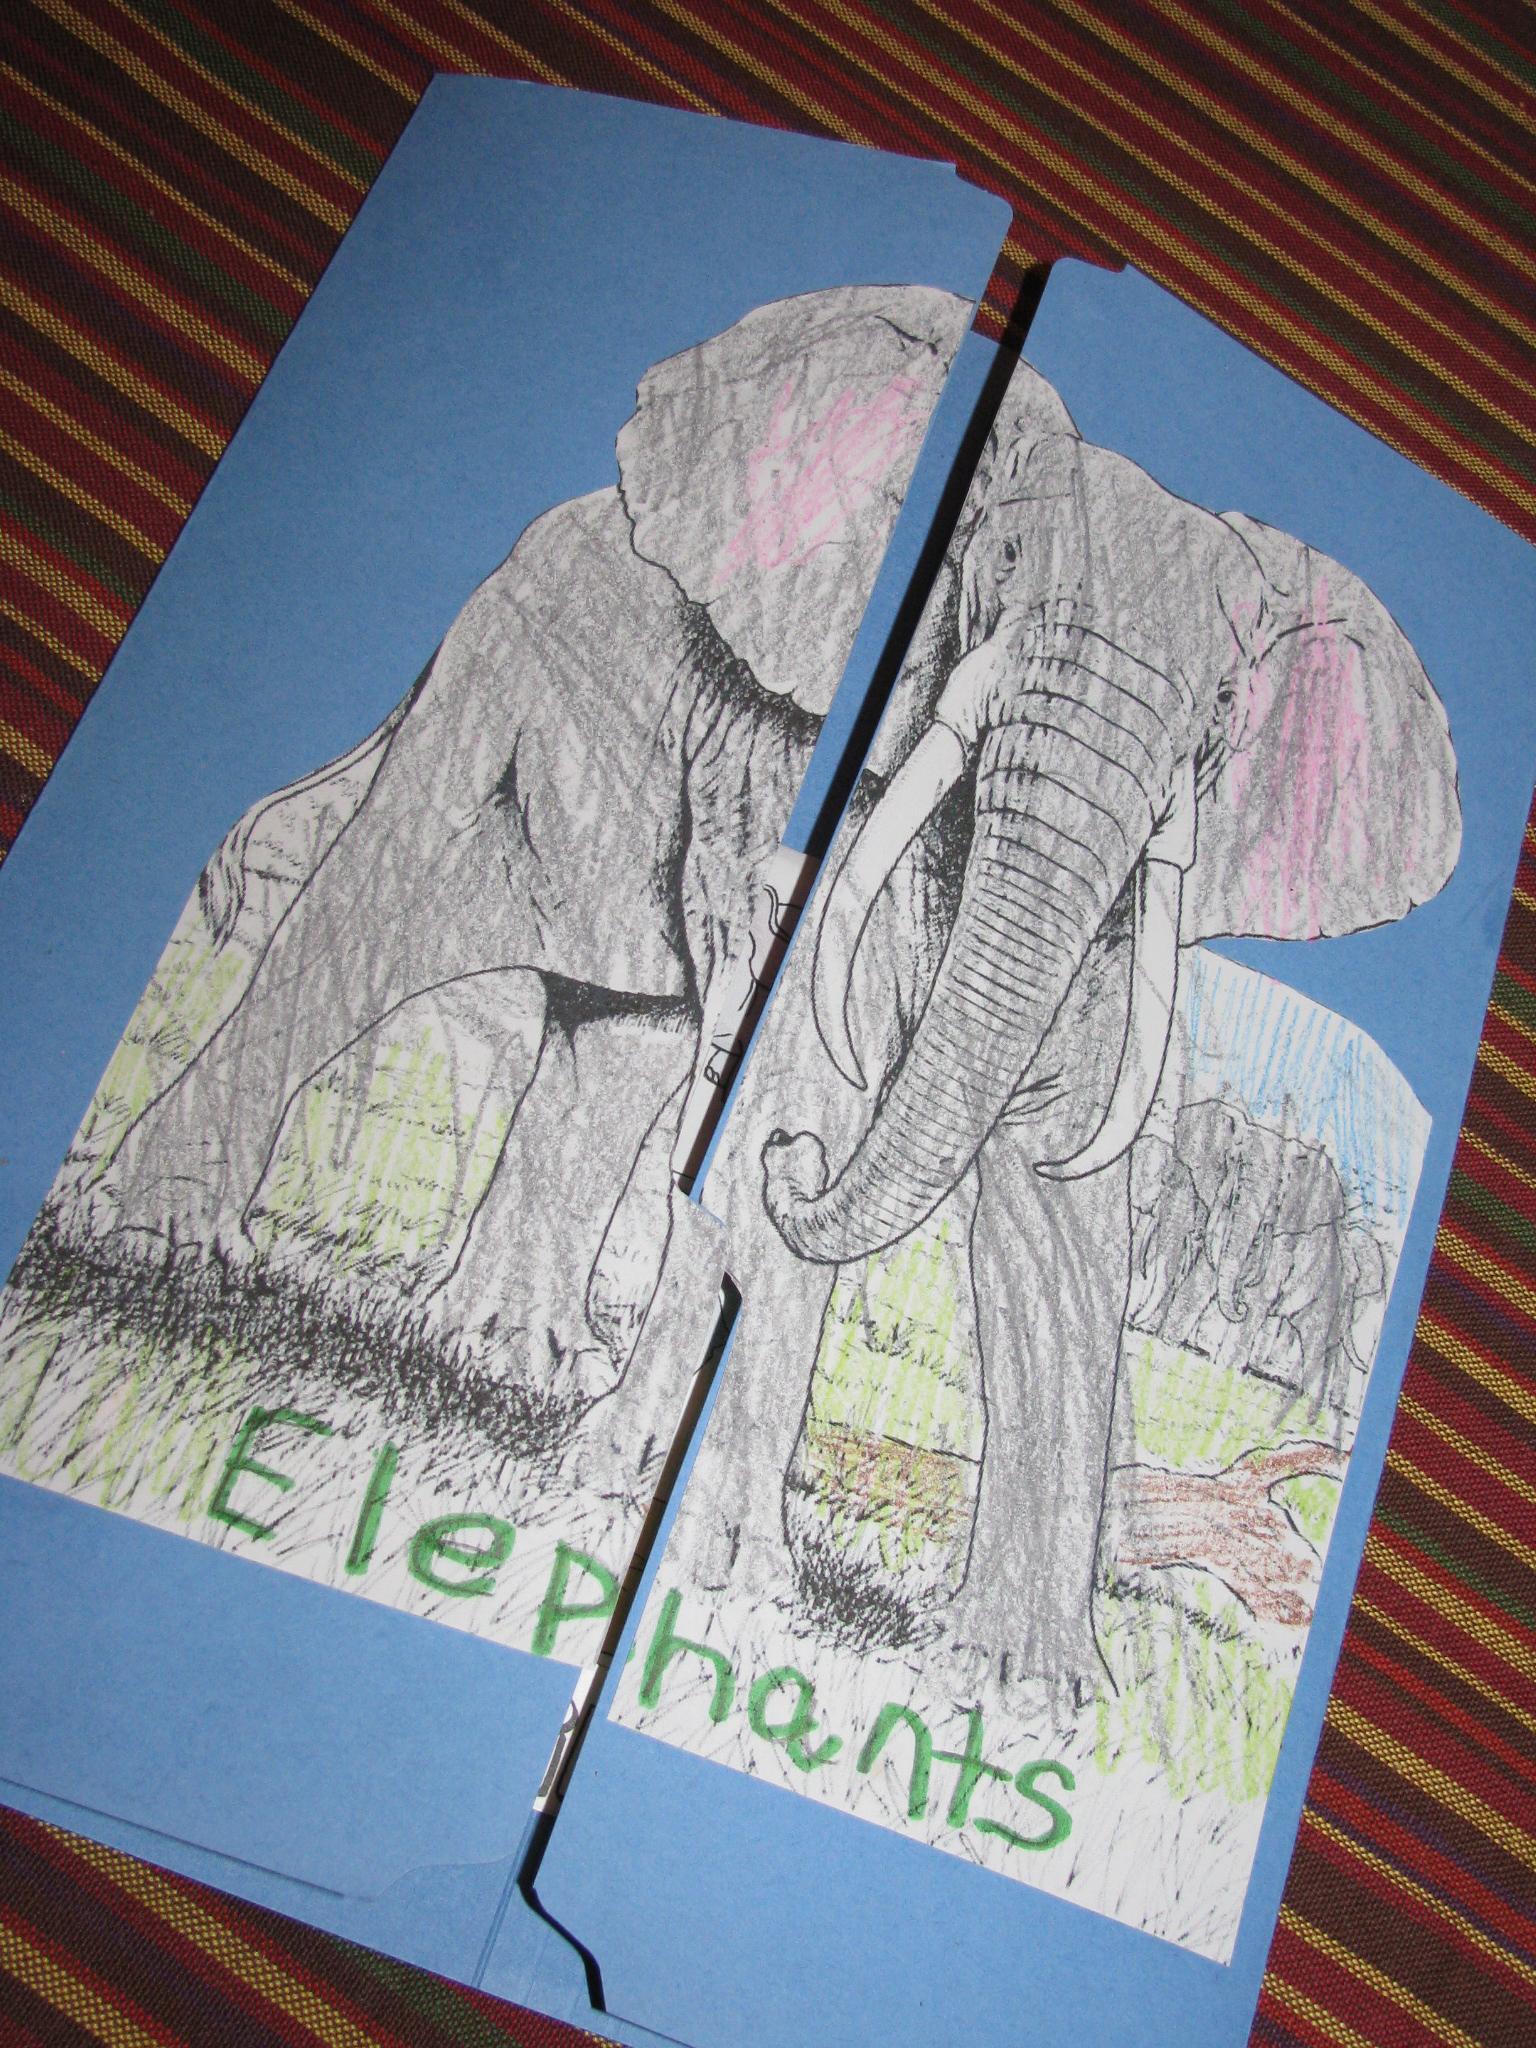 Animal Report Make A Lap Book In A File Folder Inside